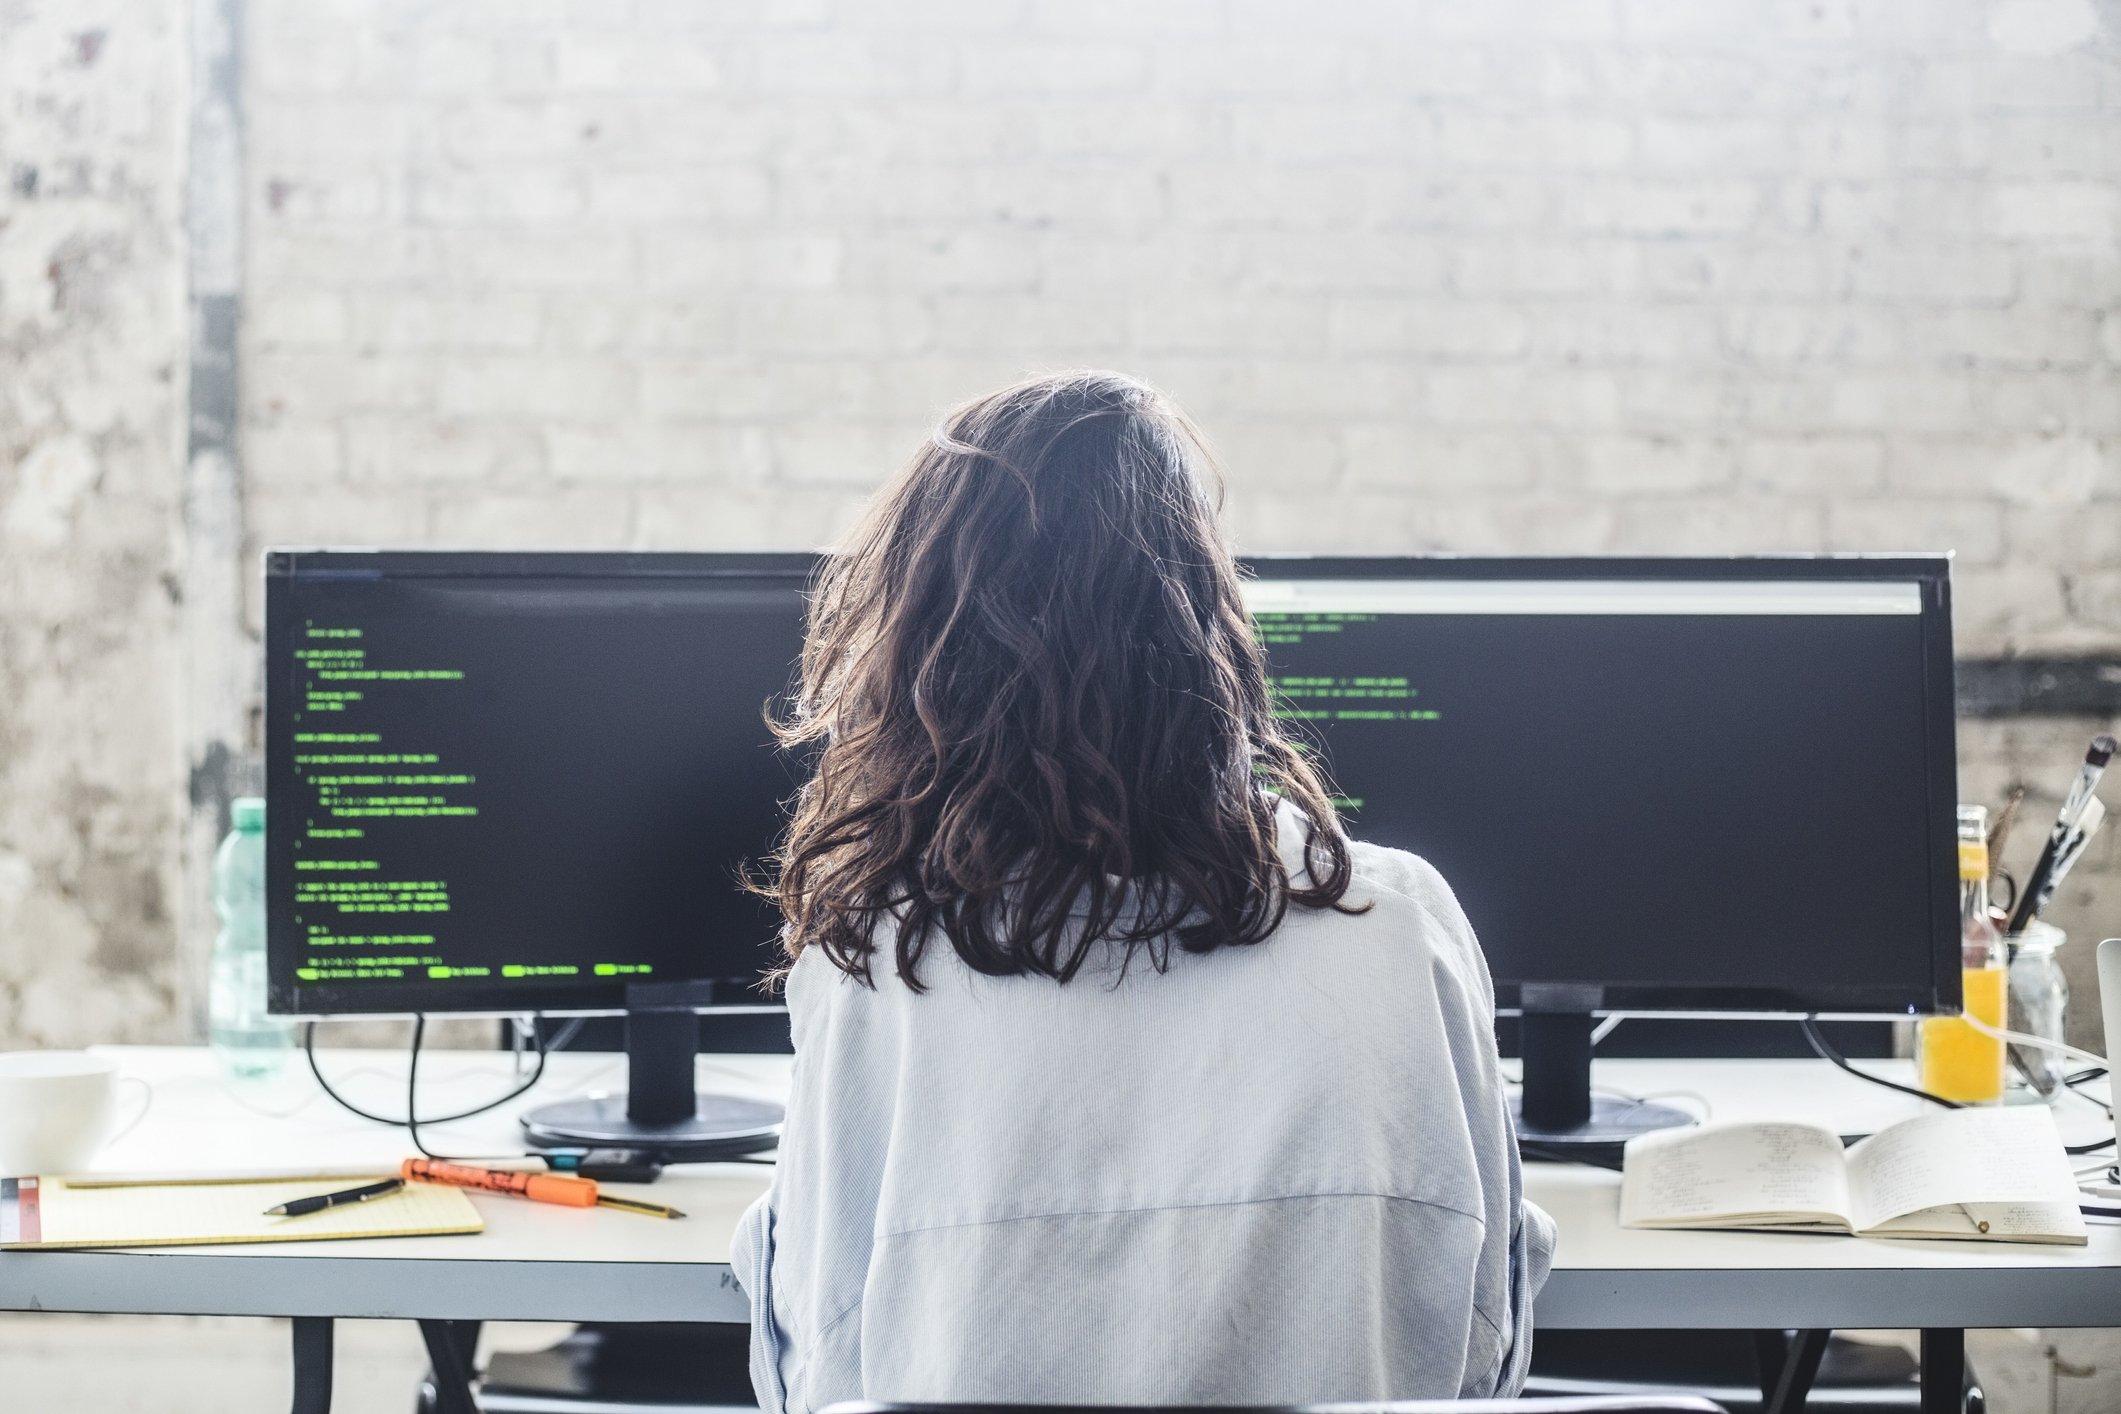 Una joven frente a dos computadoras